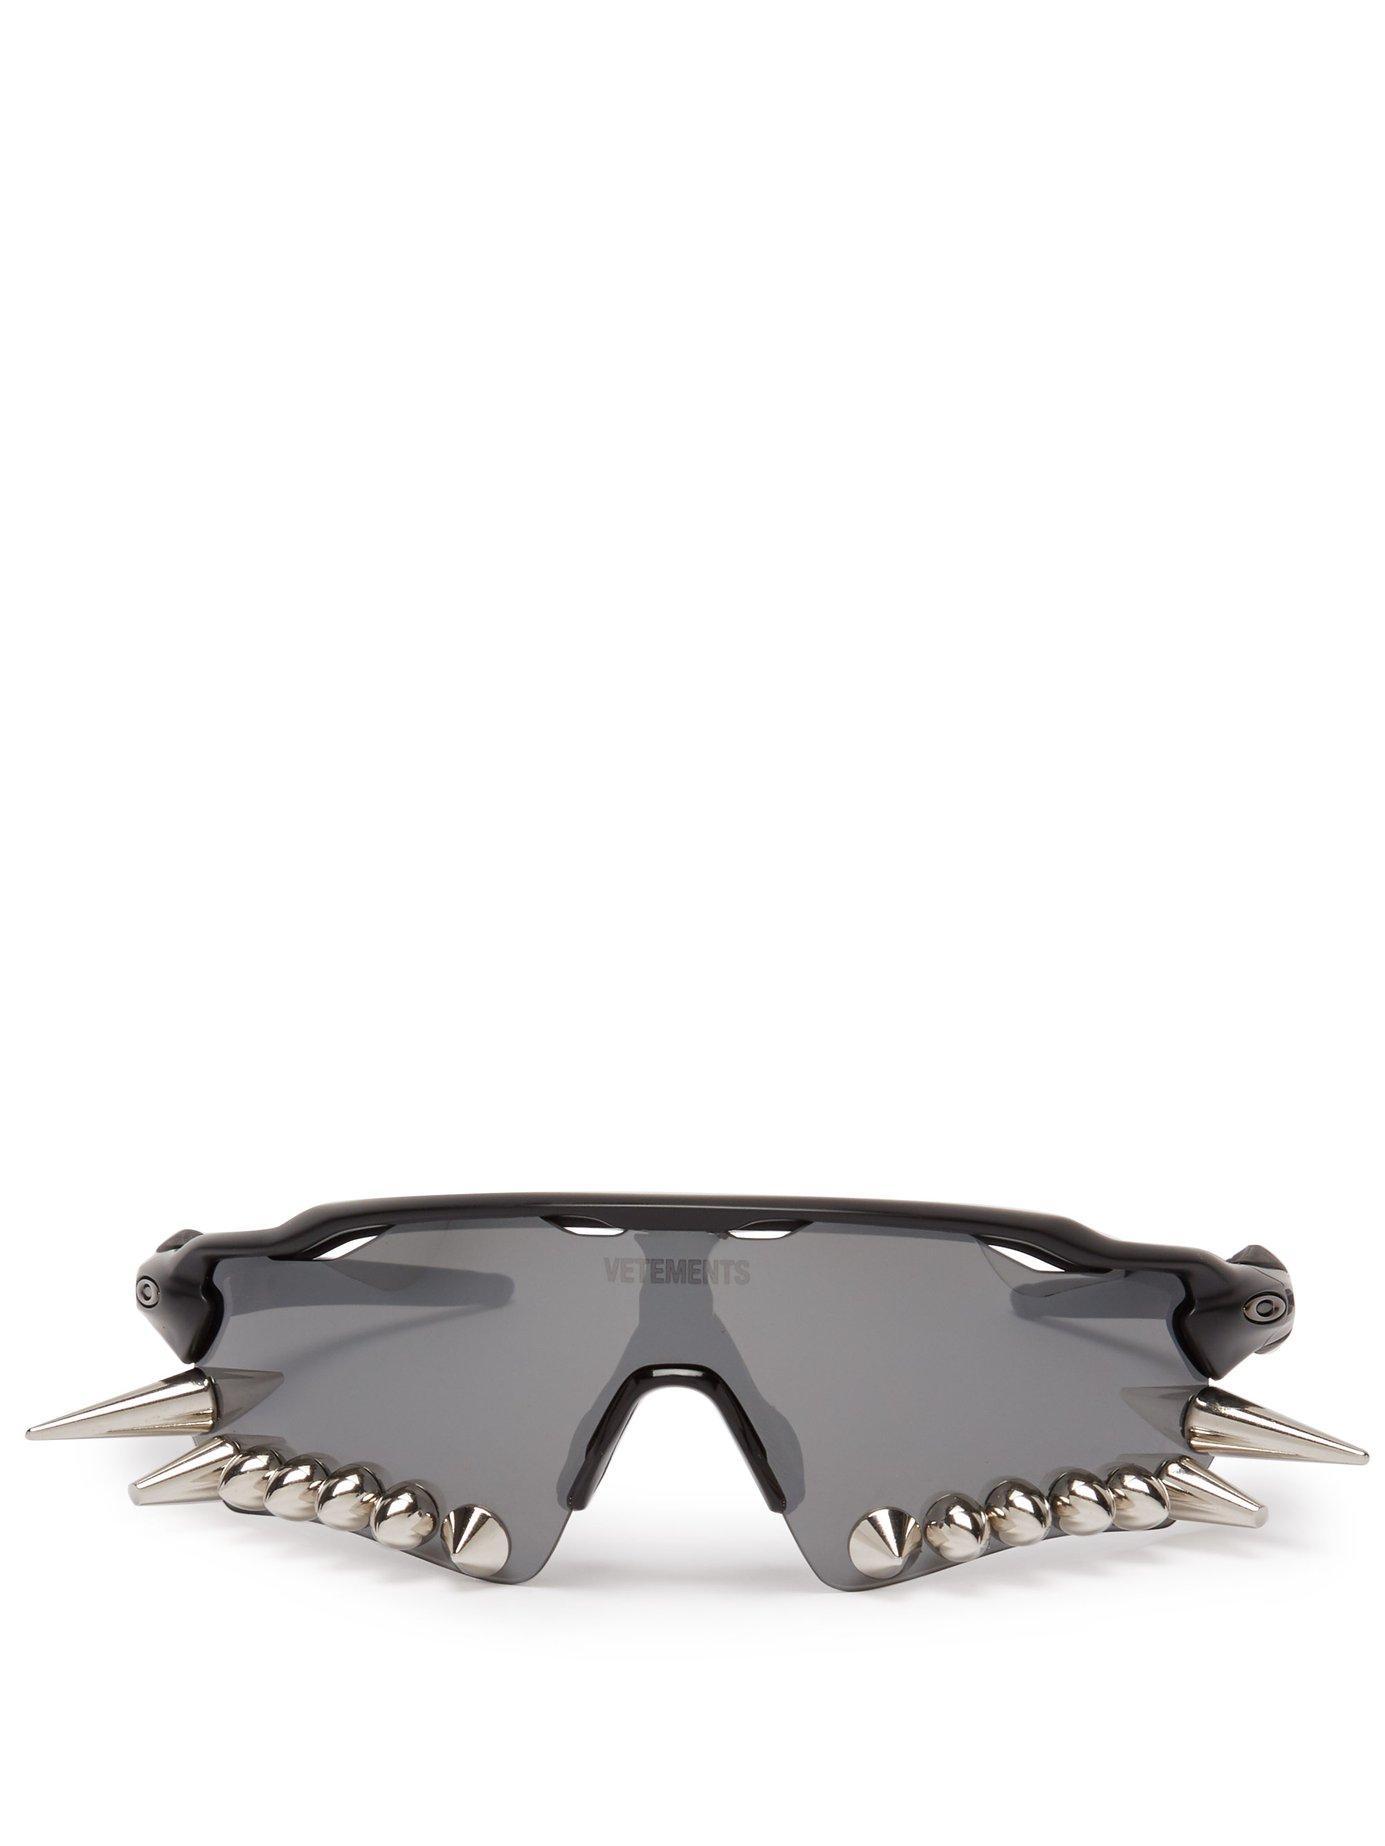 7156c861d3 Lyst - Vetements X Oakley Spikes 400 Sunglasses in Black